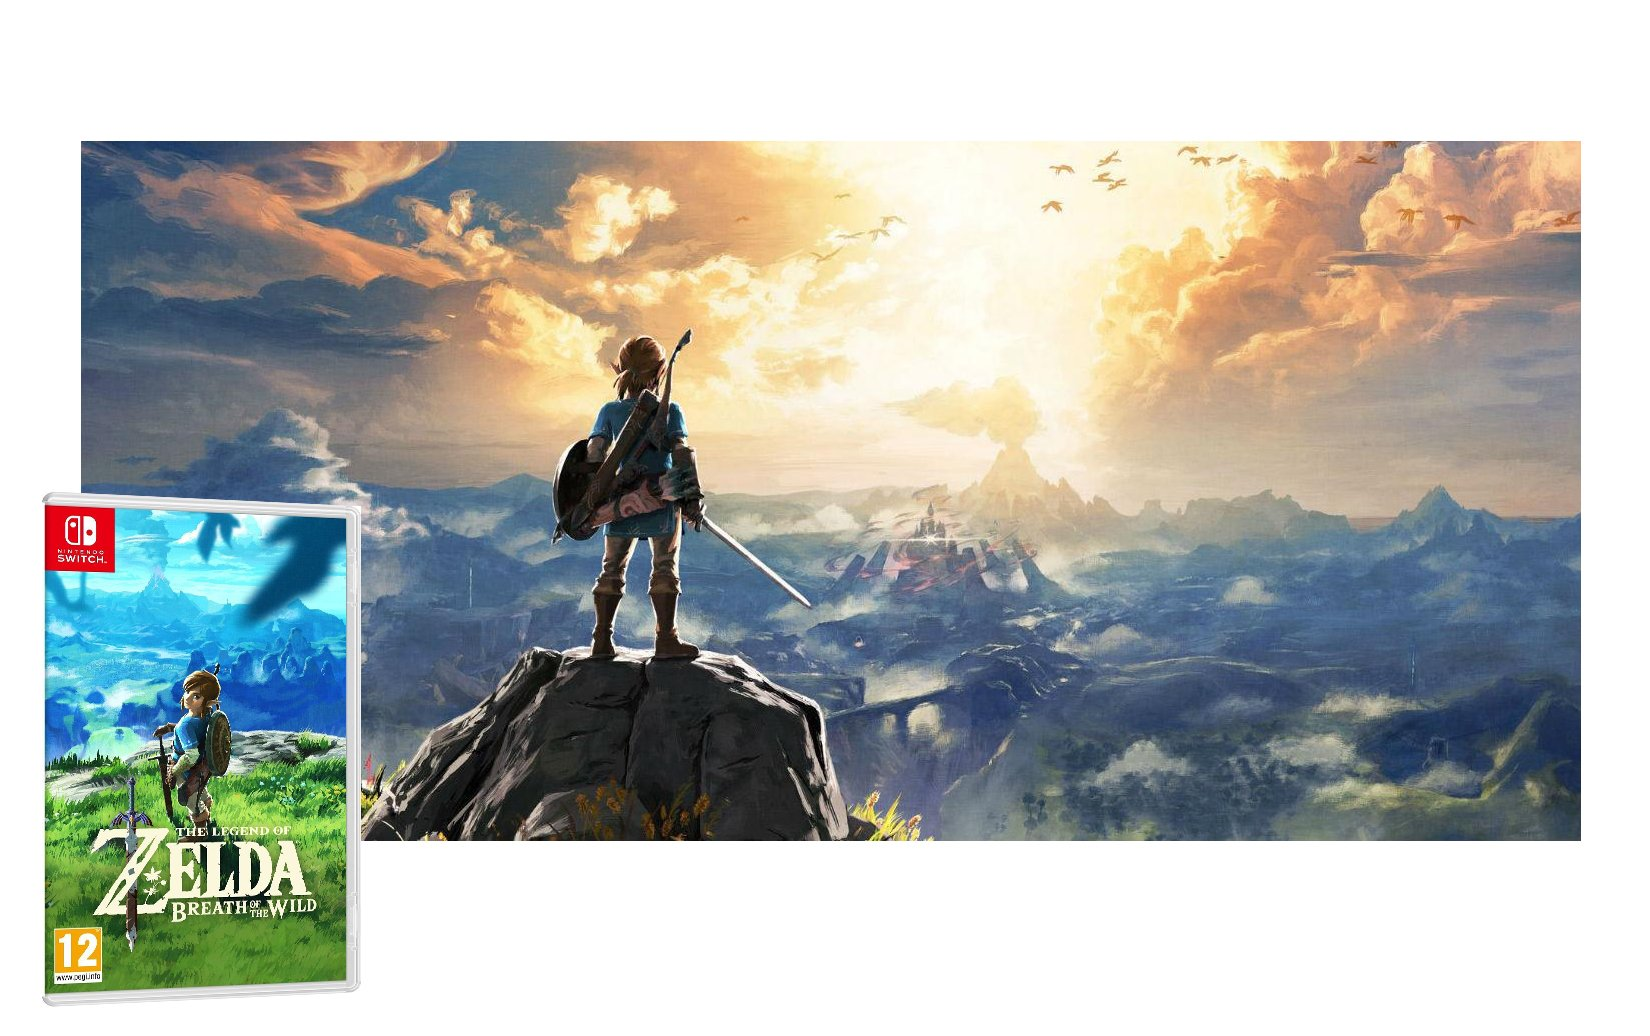 Nintendo Switch 32Gb Gris + The Legend of Zelda: Breath of The Wild: Amazon.es: Videojuegos